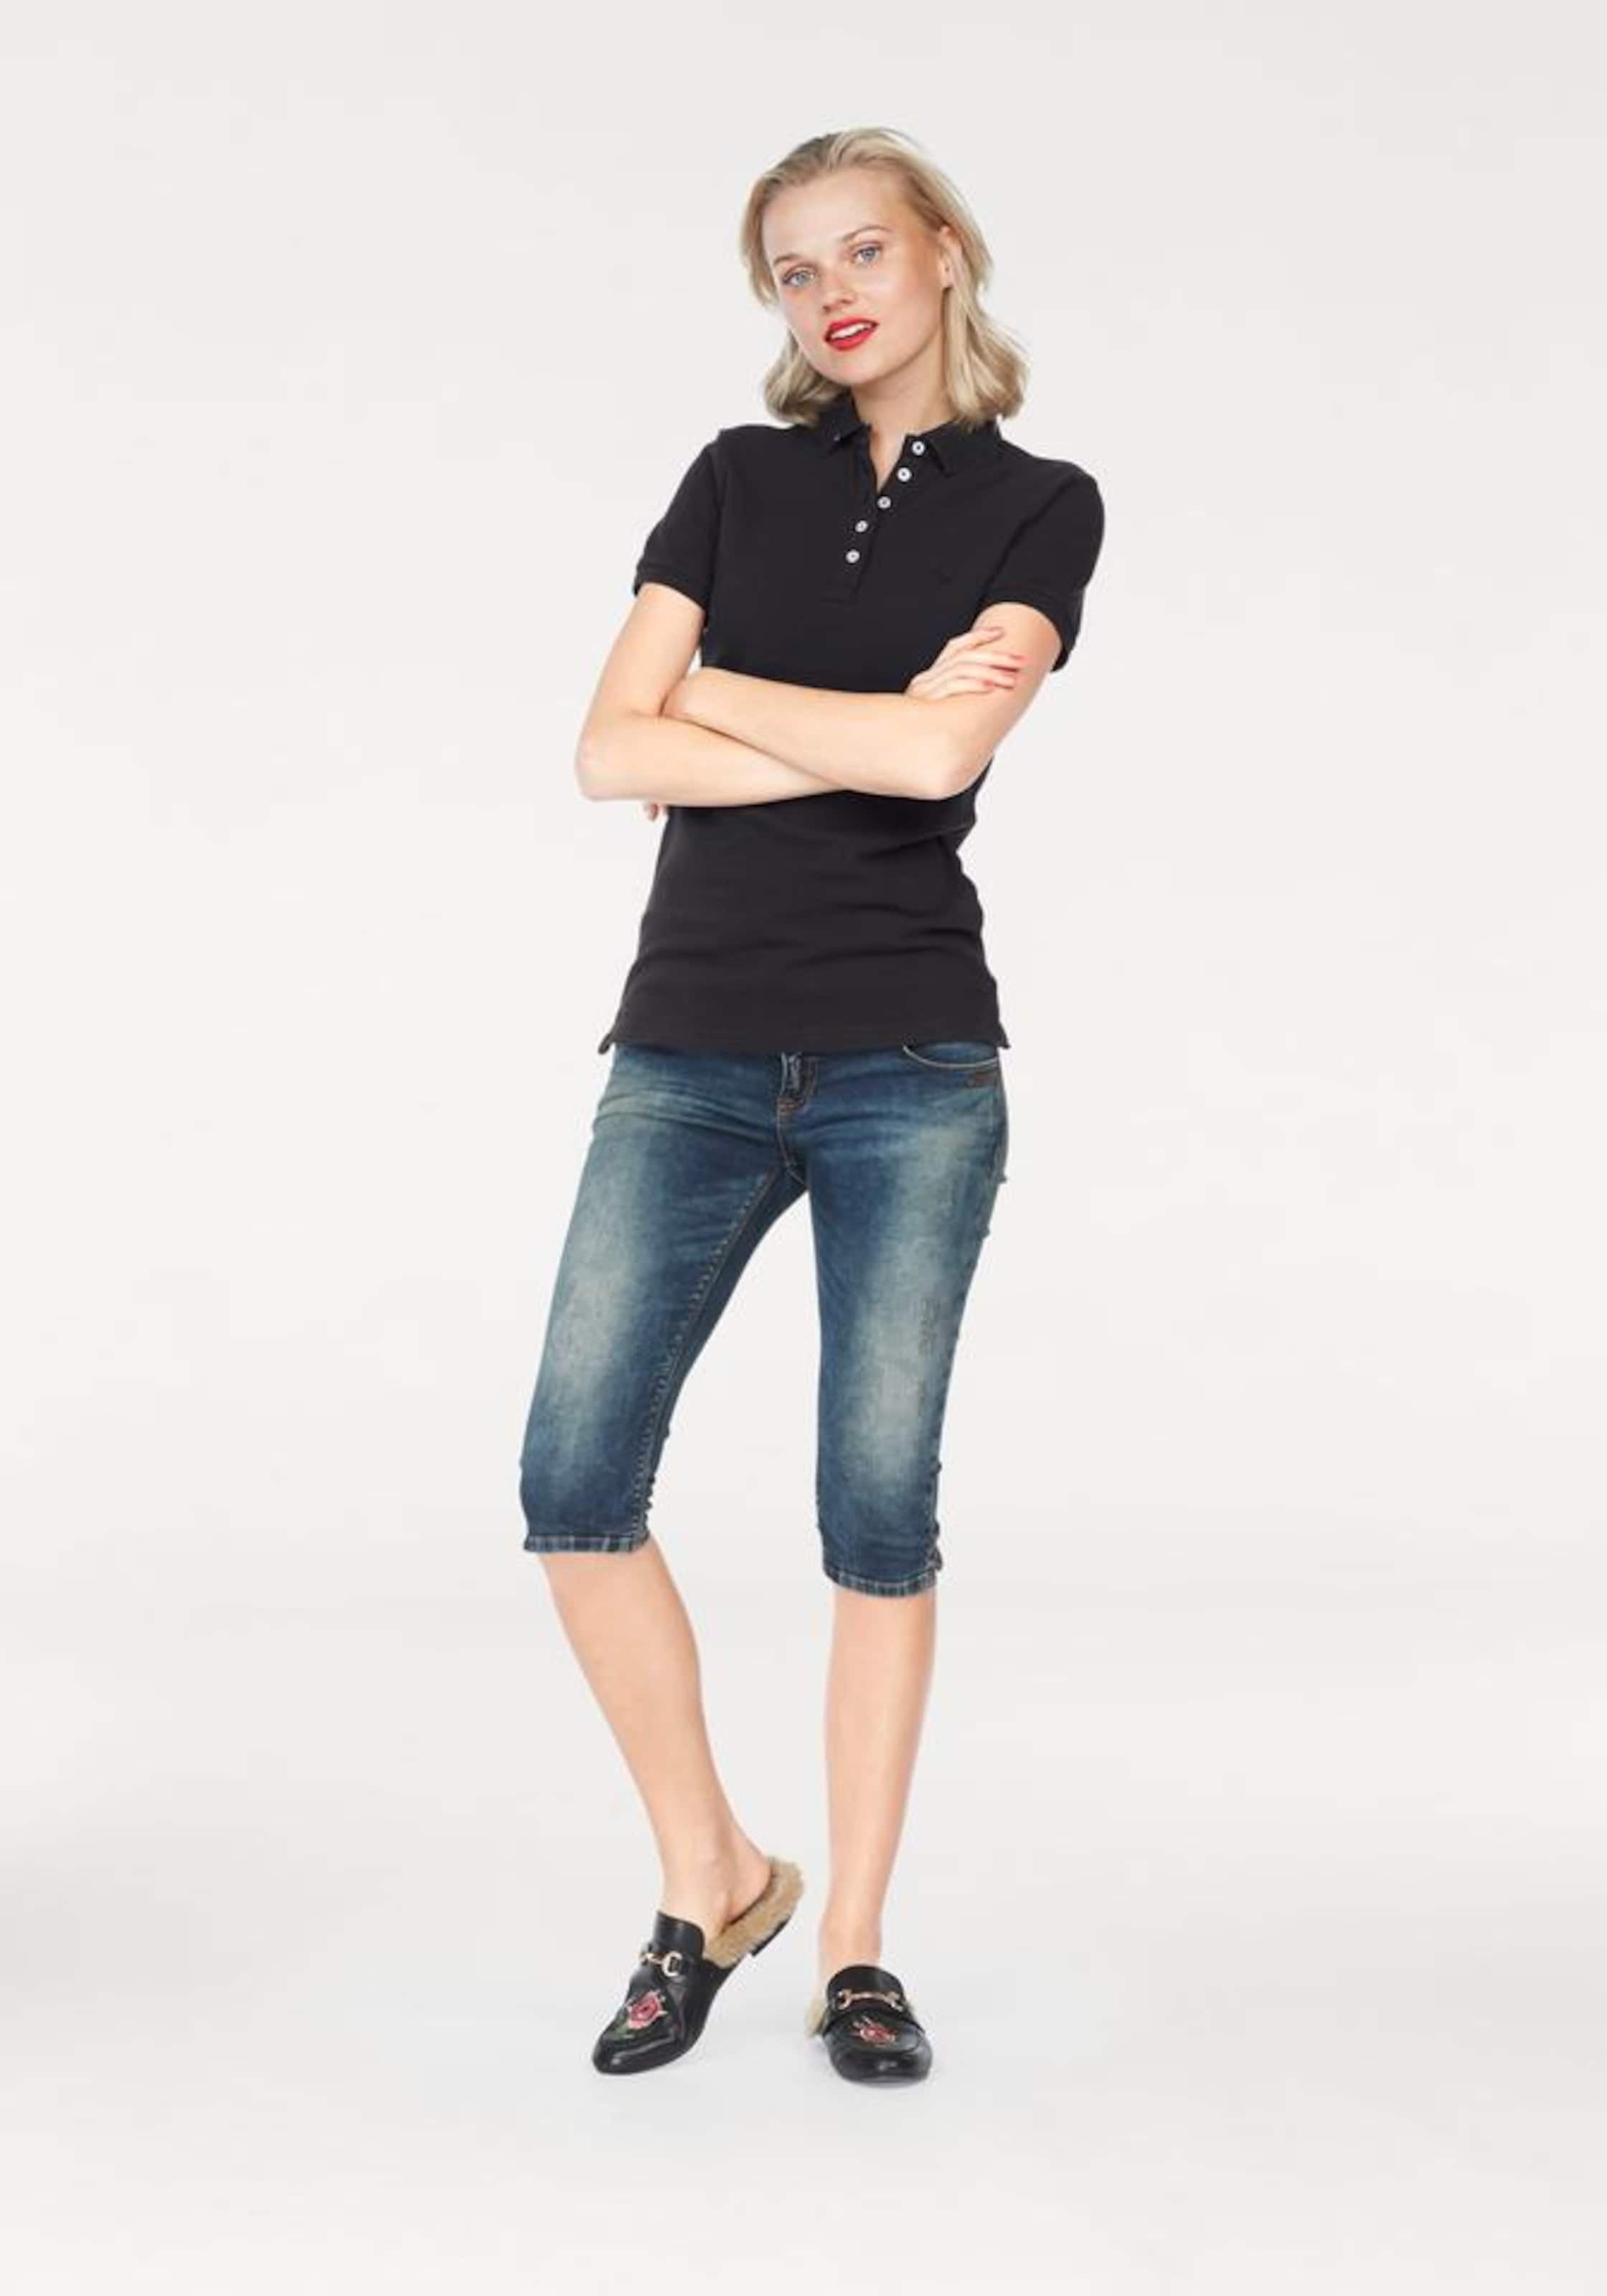 LTB Poloshirt 'ZADOTI' Online-Verkauf Sehr Günstiger Preis Rabatt Footlocker Bilder ZX5Rvl9eWn